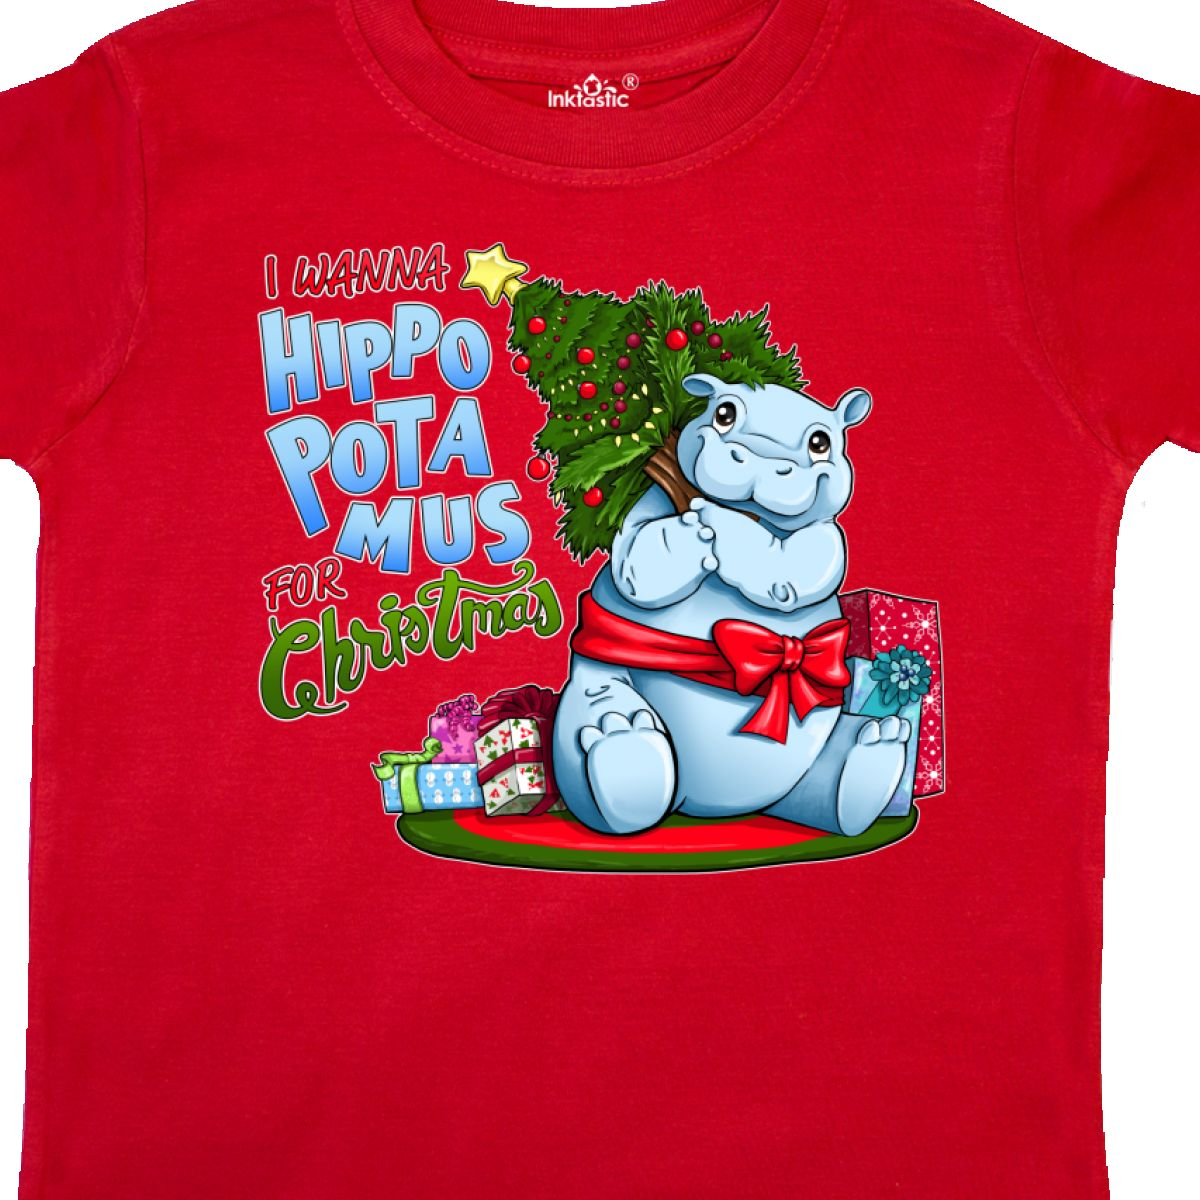 I Wanna Hippopotamus For Christmas.Details About Inktastic I Wanna Hippopotamus For Christmas Cute Hippo Toddler T Shirt Holiday